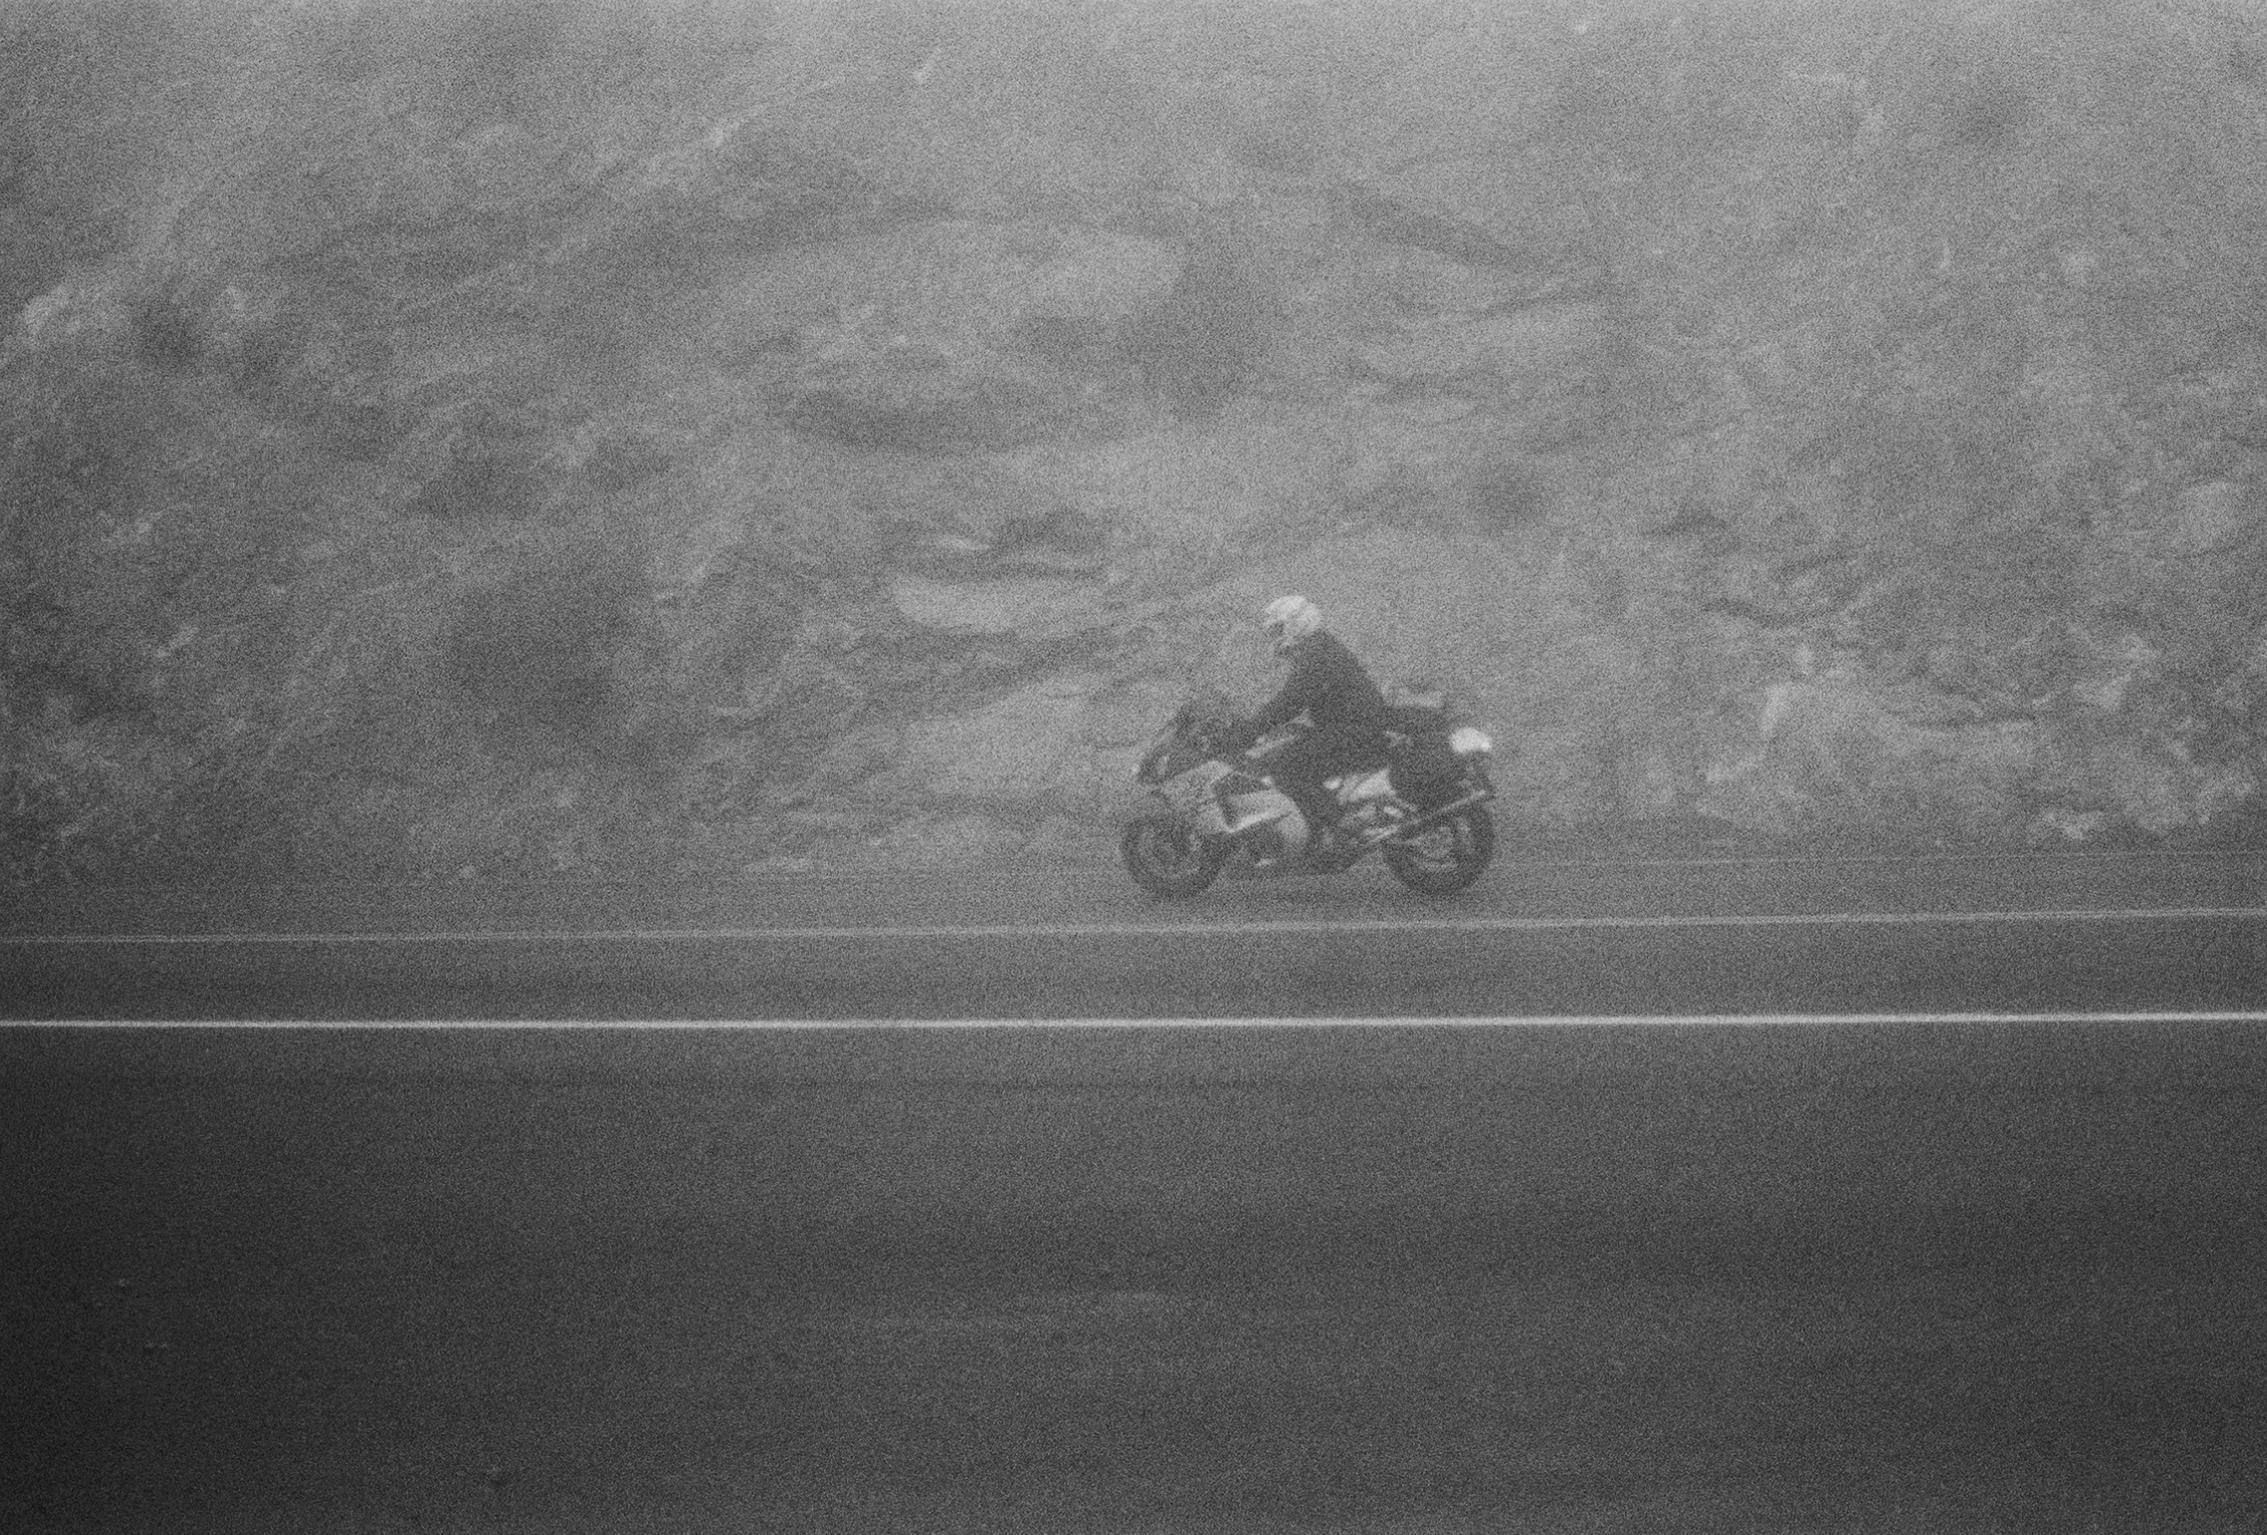 Angeles Crest Highway - 2013